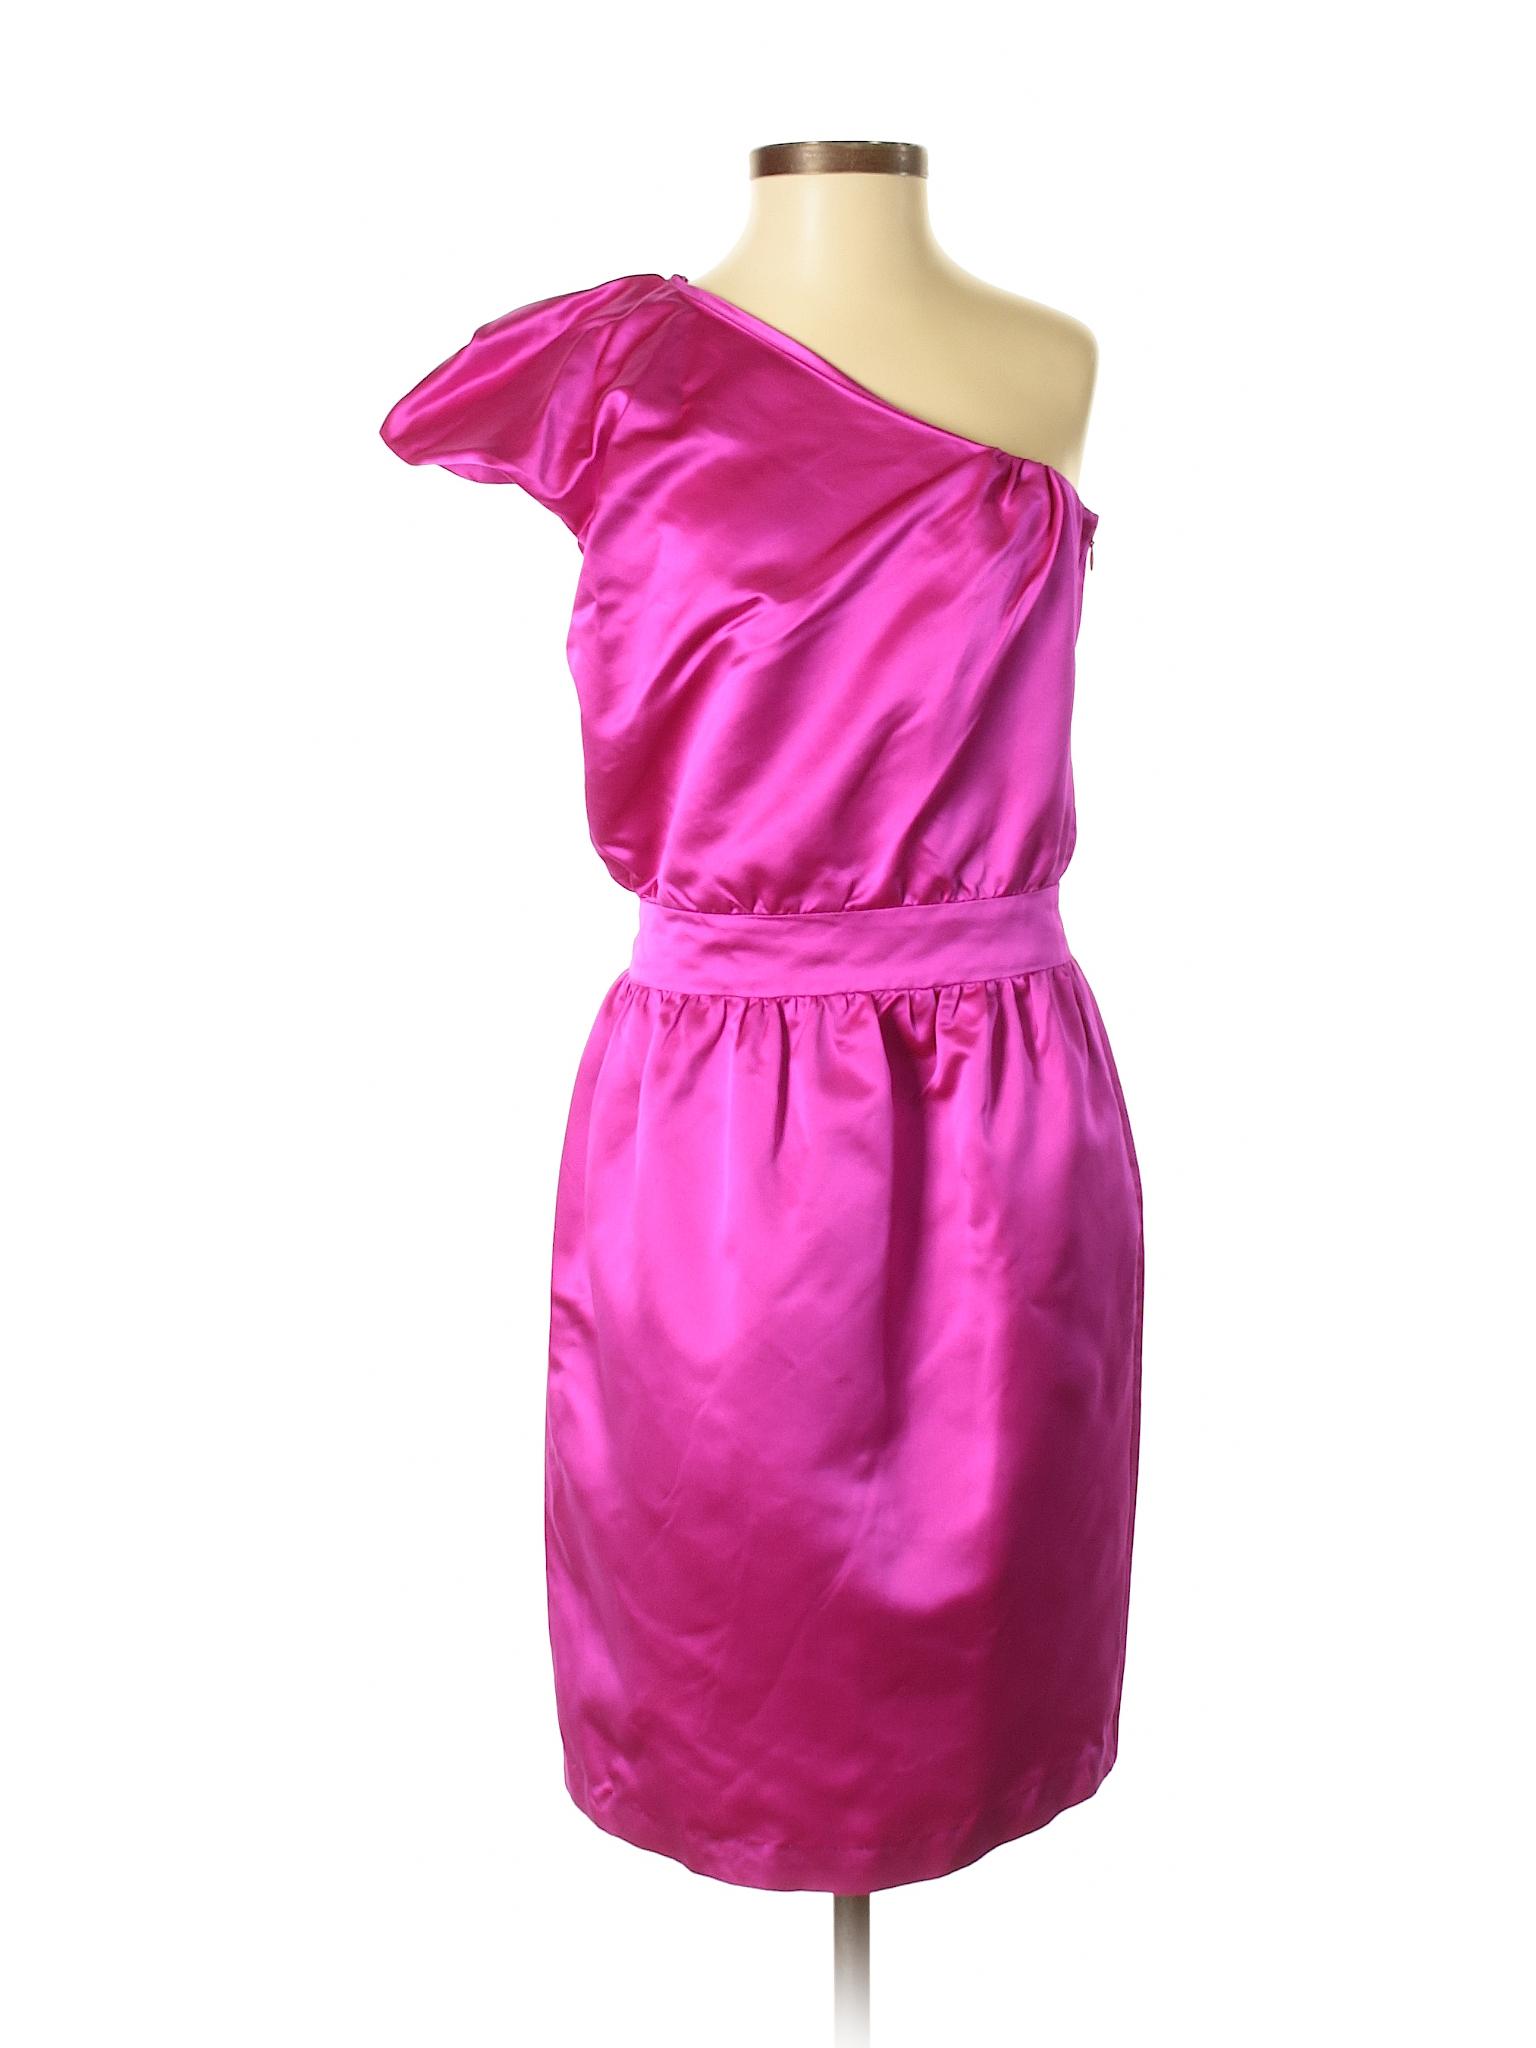 Boutique Cocktail Winter For Marshalls Dress Cynthia Rowley aqRfrwxaB